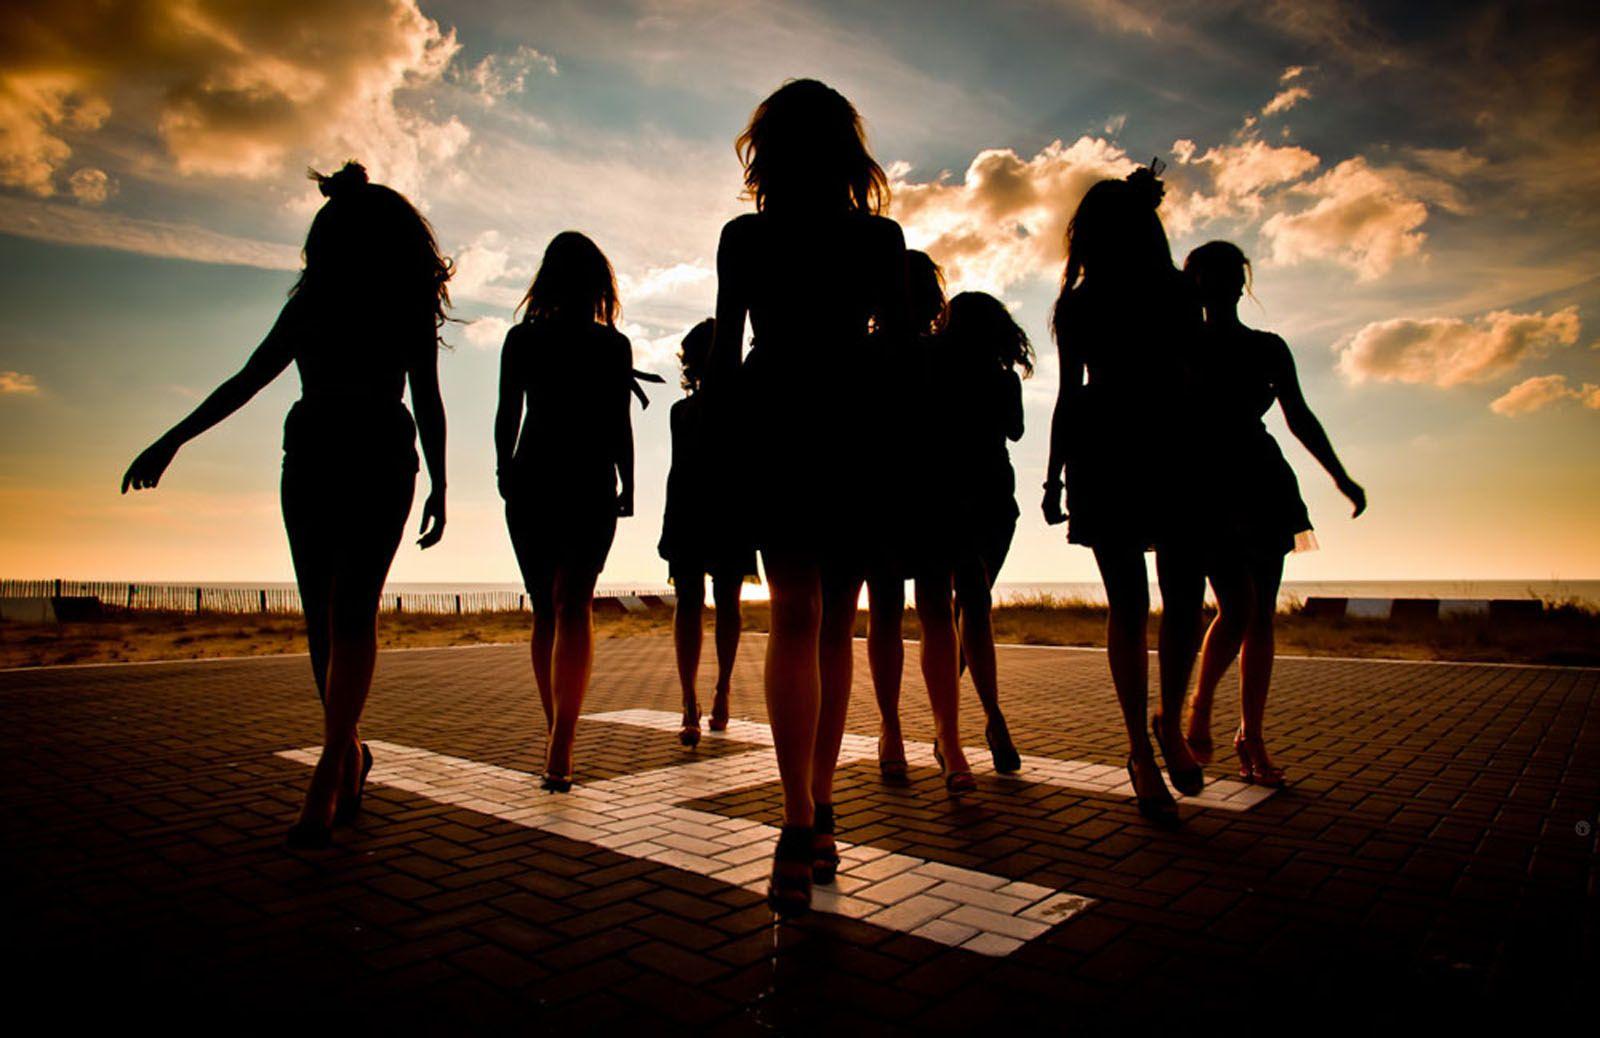 Wandelende vrouwen - Adrian Kuipers Photography